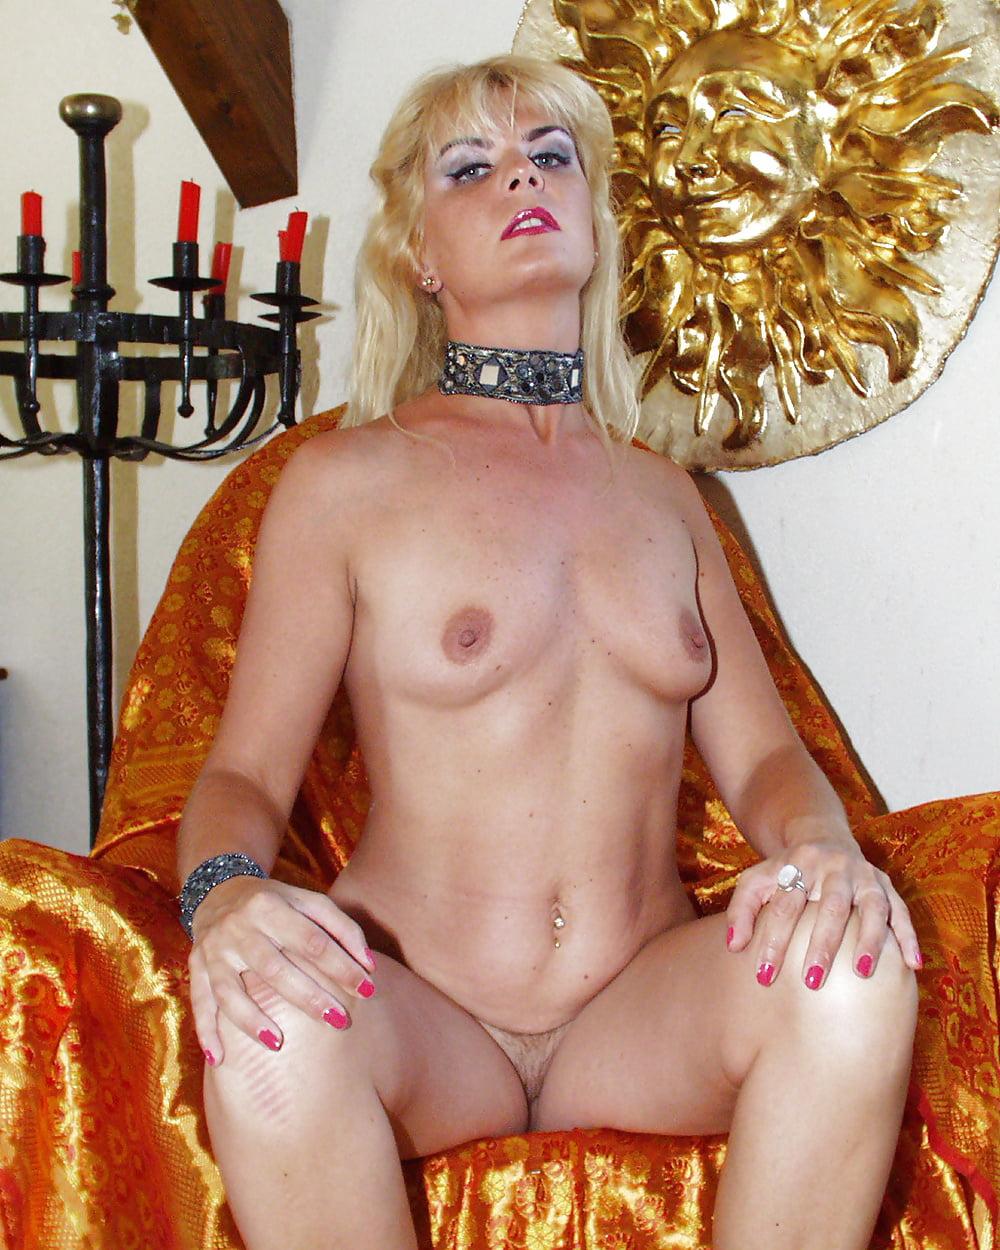 blonde-whore-galleries